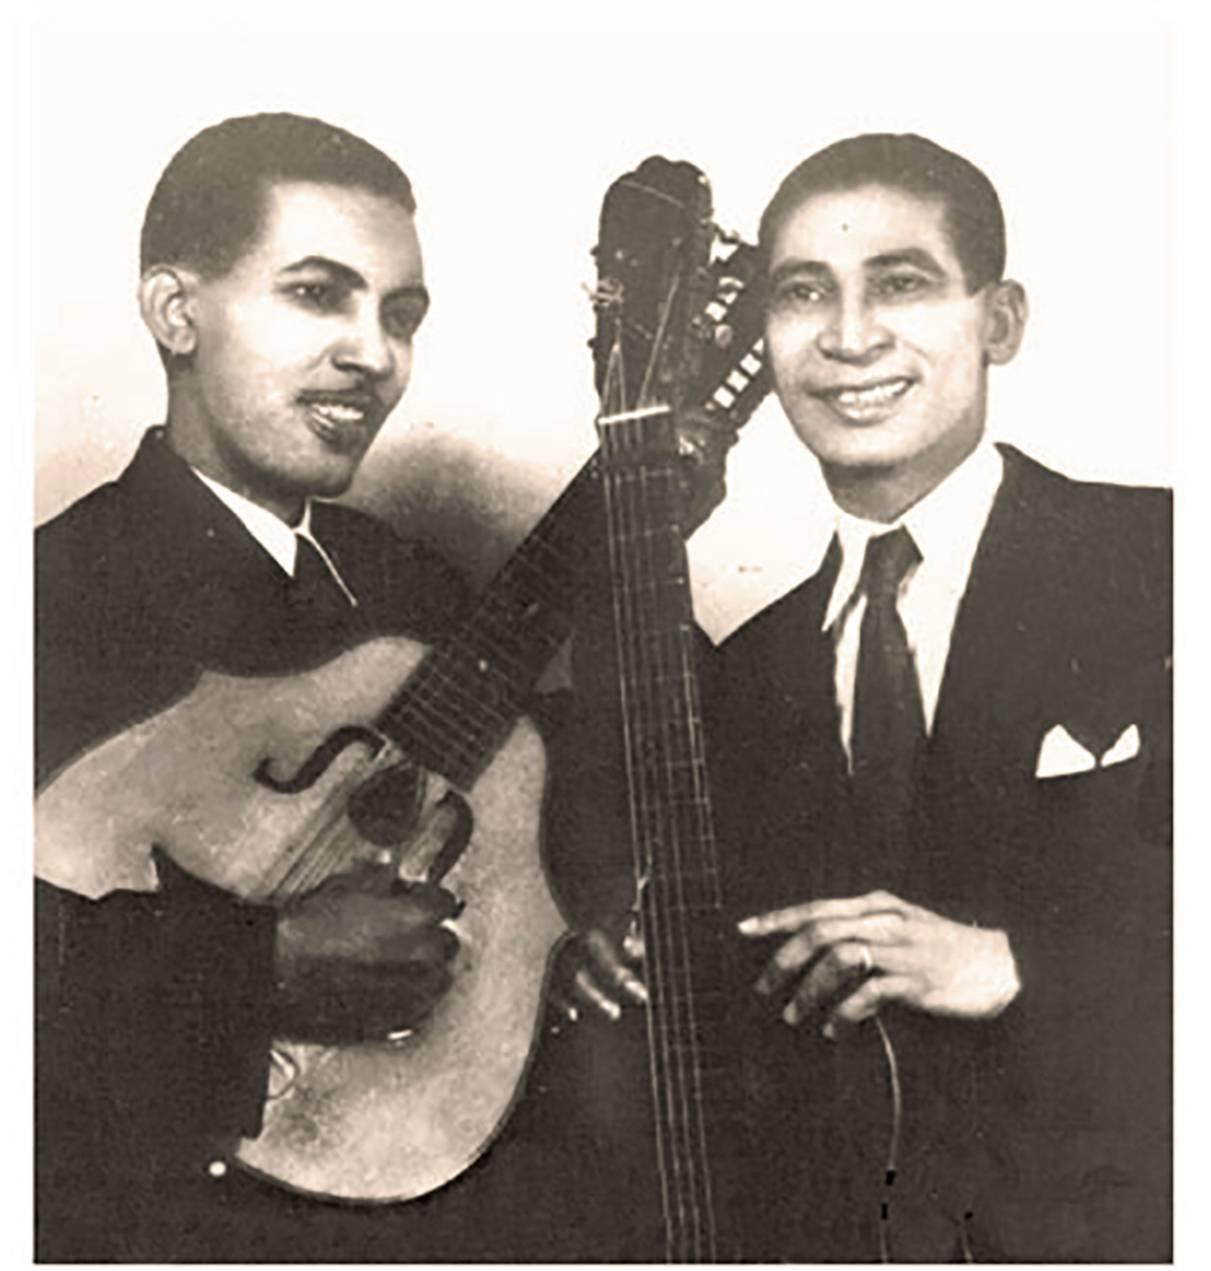 Francisco Repilado and Lorenzo Hierrezuelo, members of the legendary duo Los Compadres. Photo: Smoke Graphic.